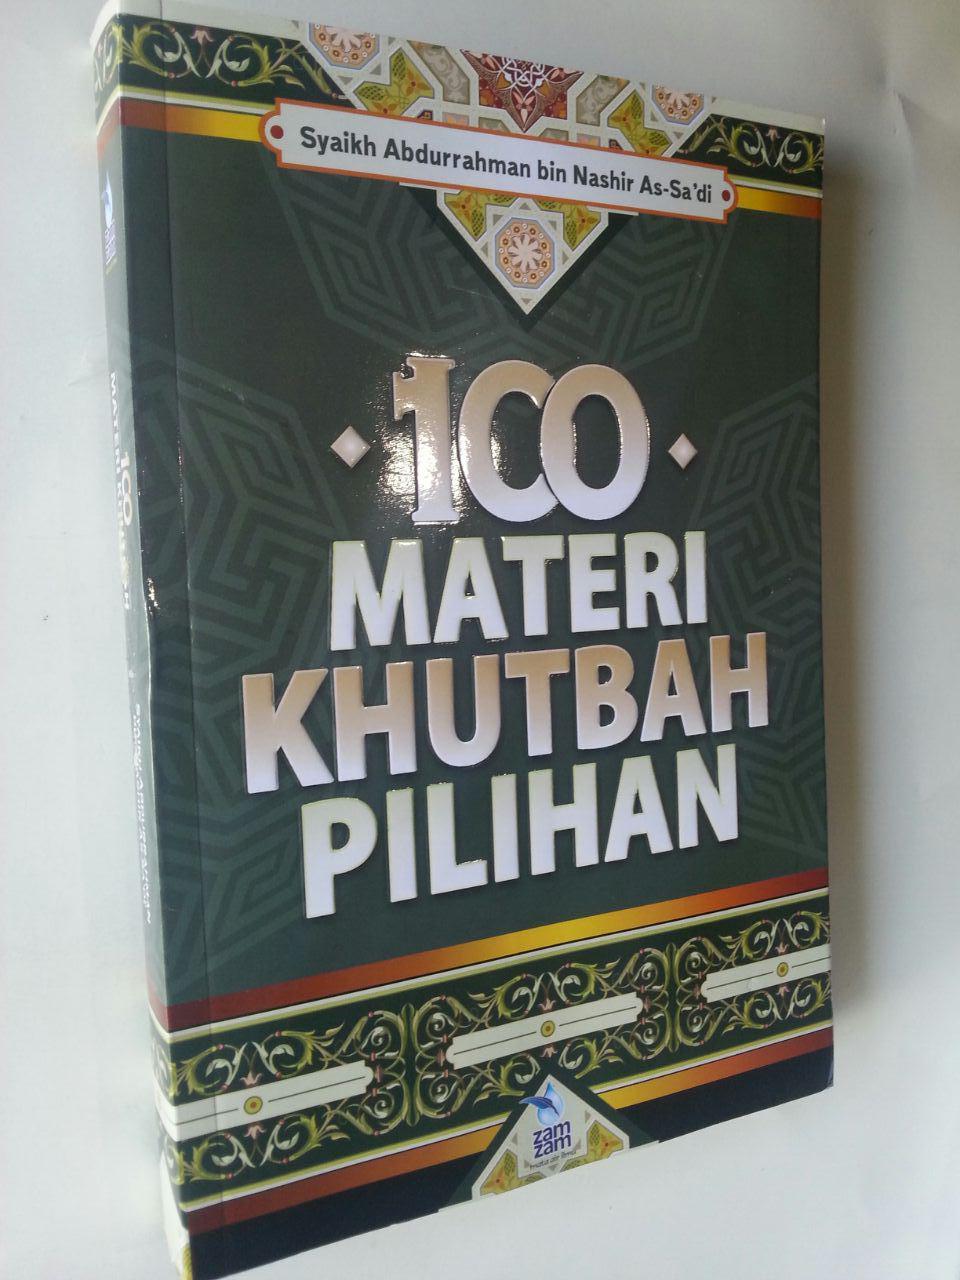 Buku 100 Materi Khutbah Pilihan cover